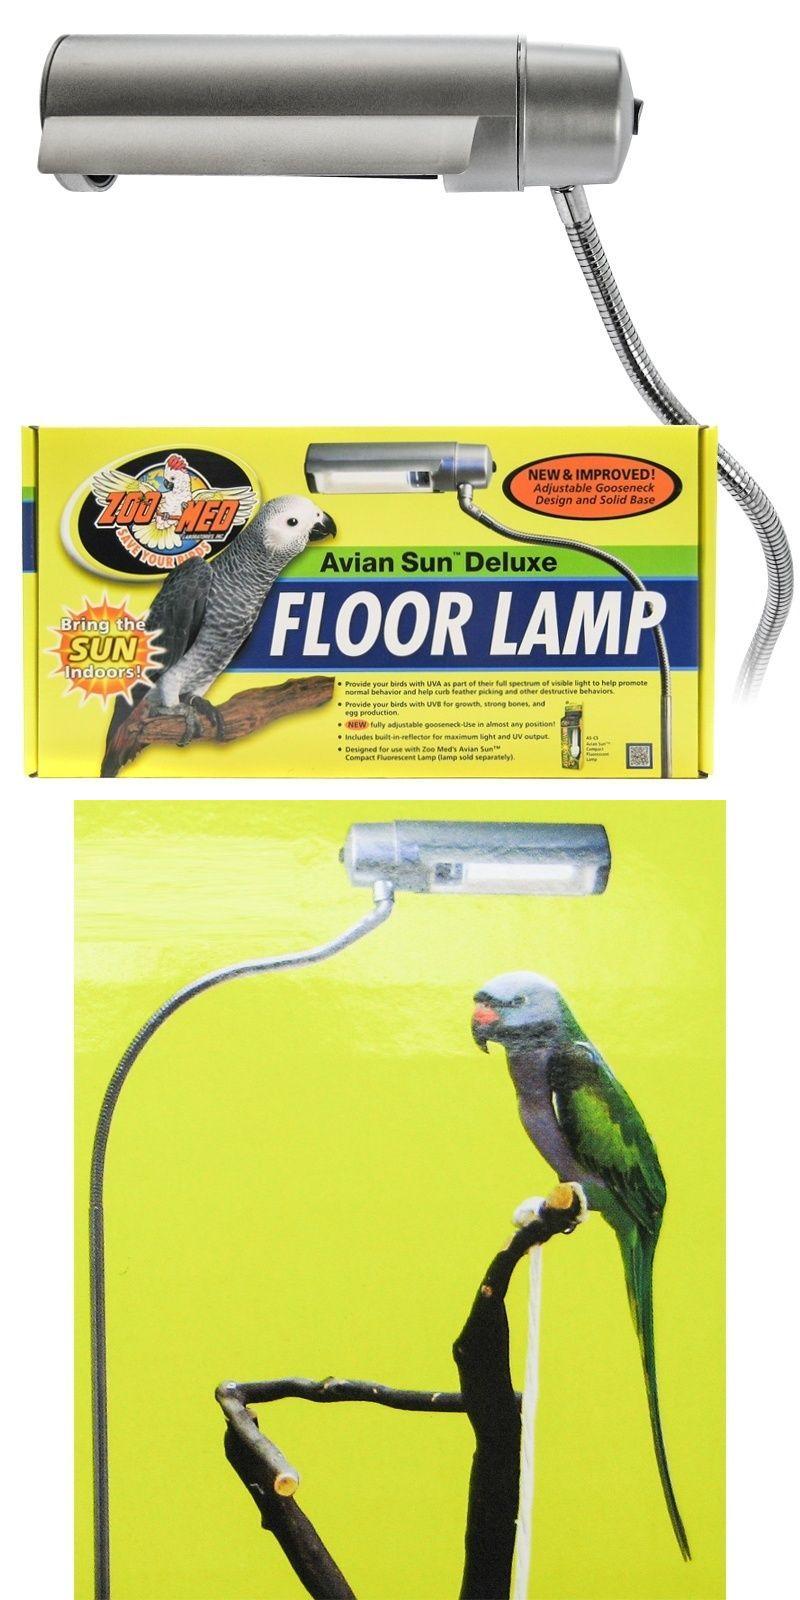 Other bird supplies 3211 zoo med avian sun deluxe floor lamp bird other bird supplies 3211 zoo med avian sun deluxe floor lamp bird birds mozeypictures Gallery